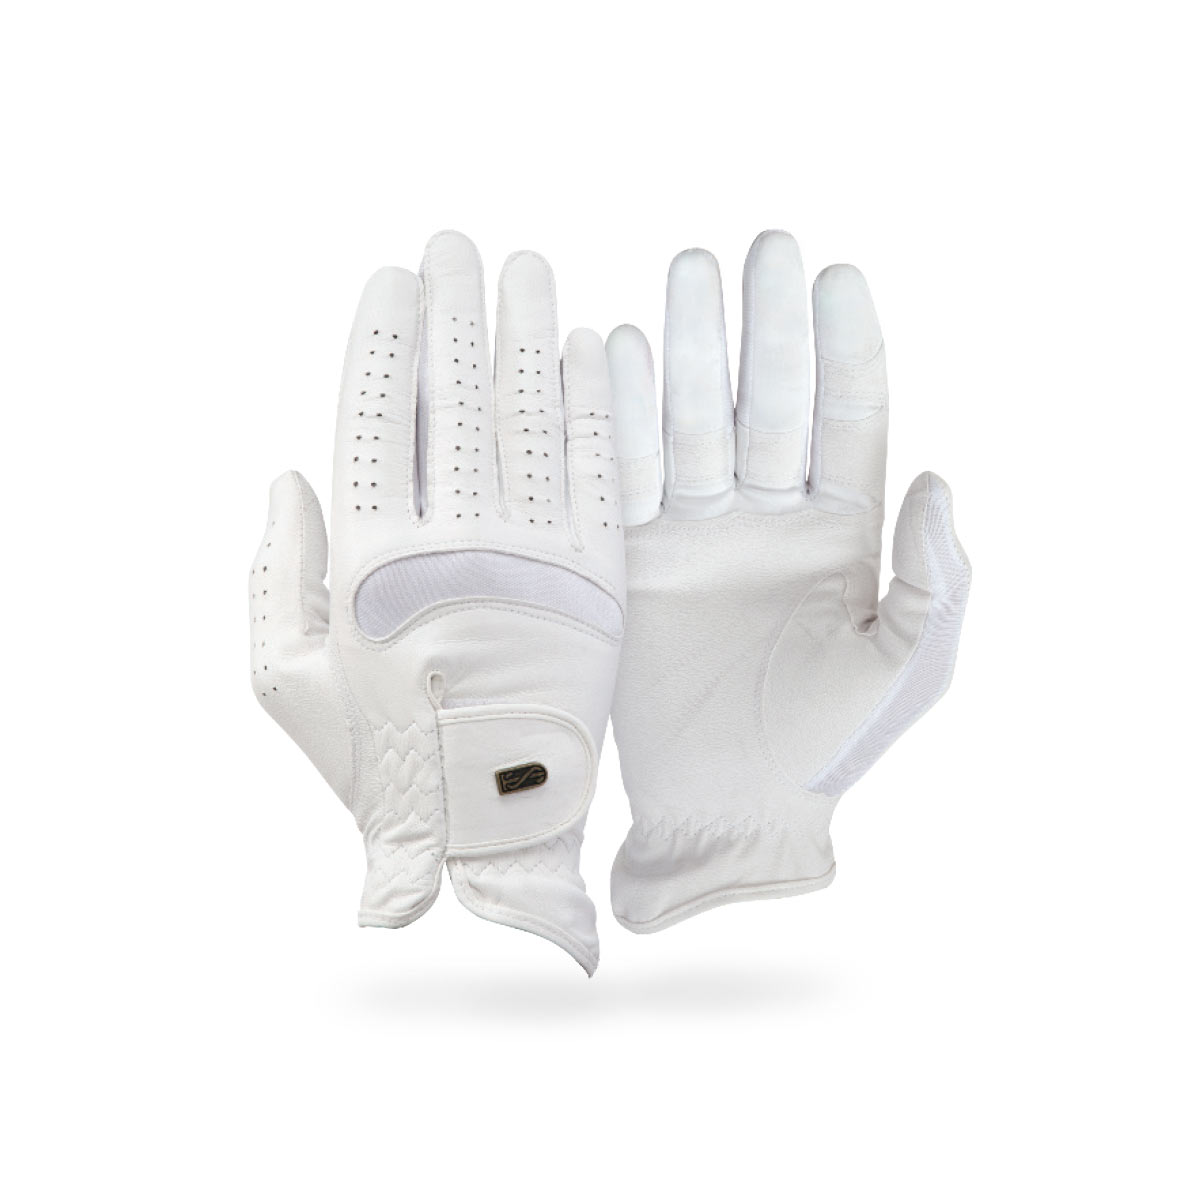 Tredstep Pro Riding Gloves